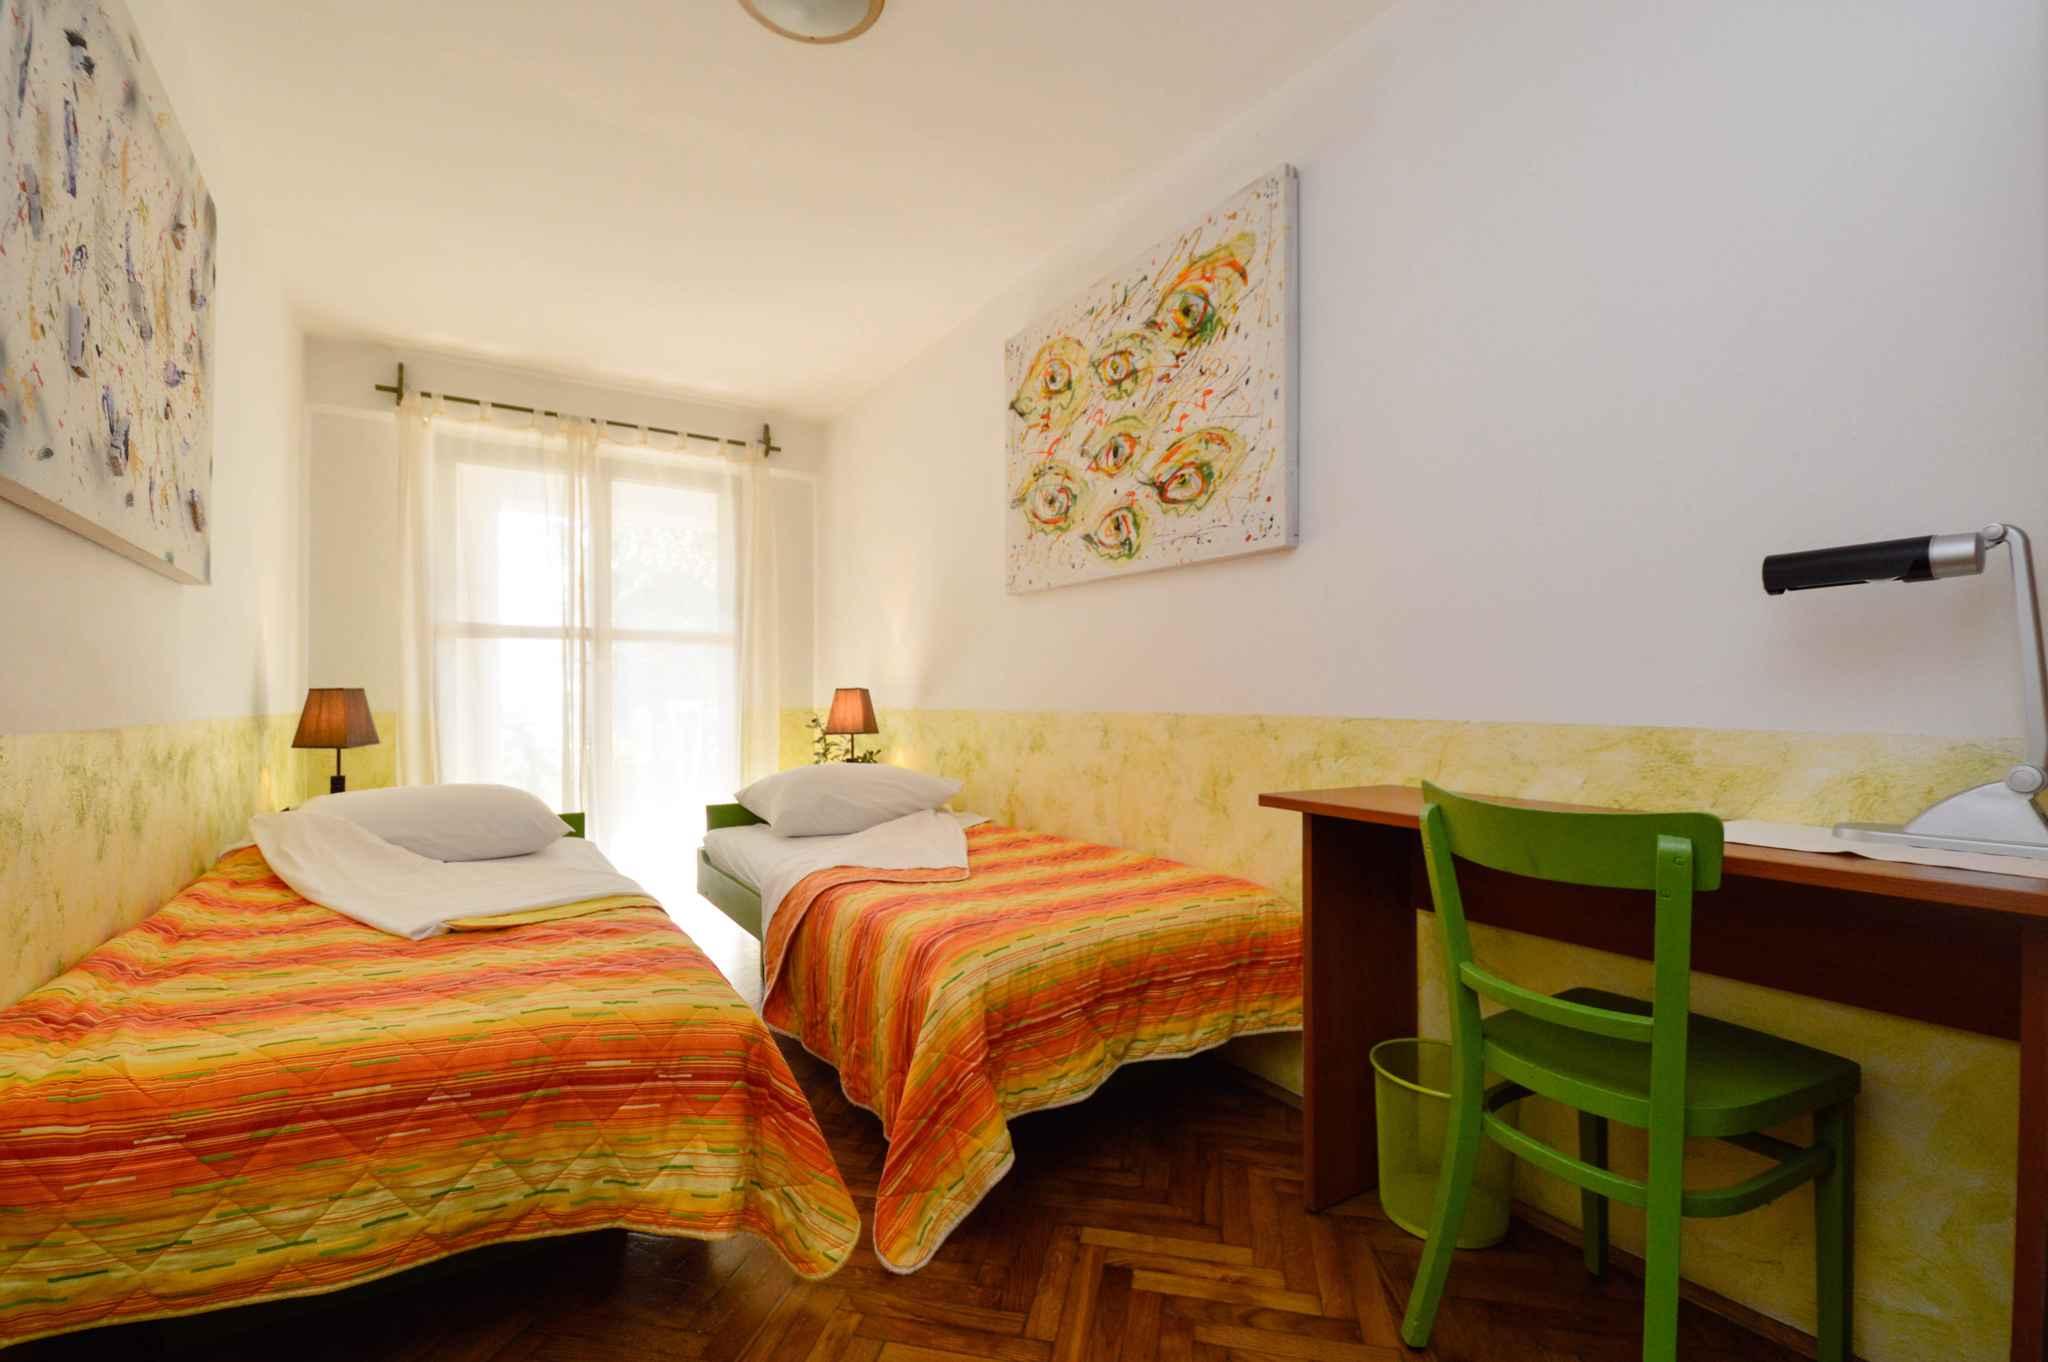 Ferienwohnung direkt am Meer gelegen (280674), Pula, , Istrien, Kroatien, Bild 18